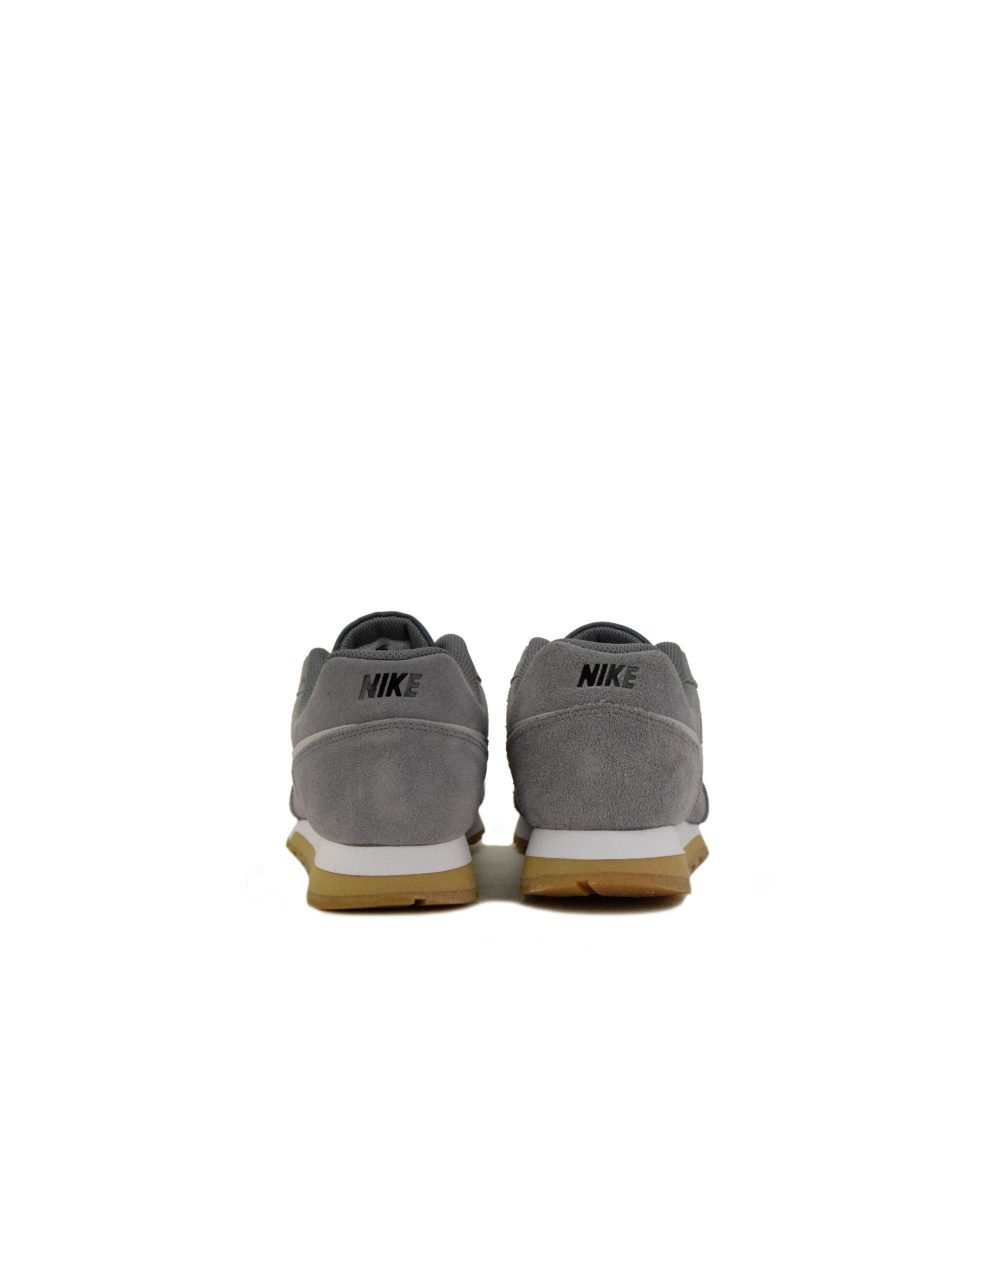 Nike MD Runner 2 Suede (AQ9211 002) Gunsmoke Grey